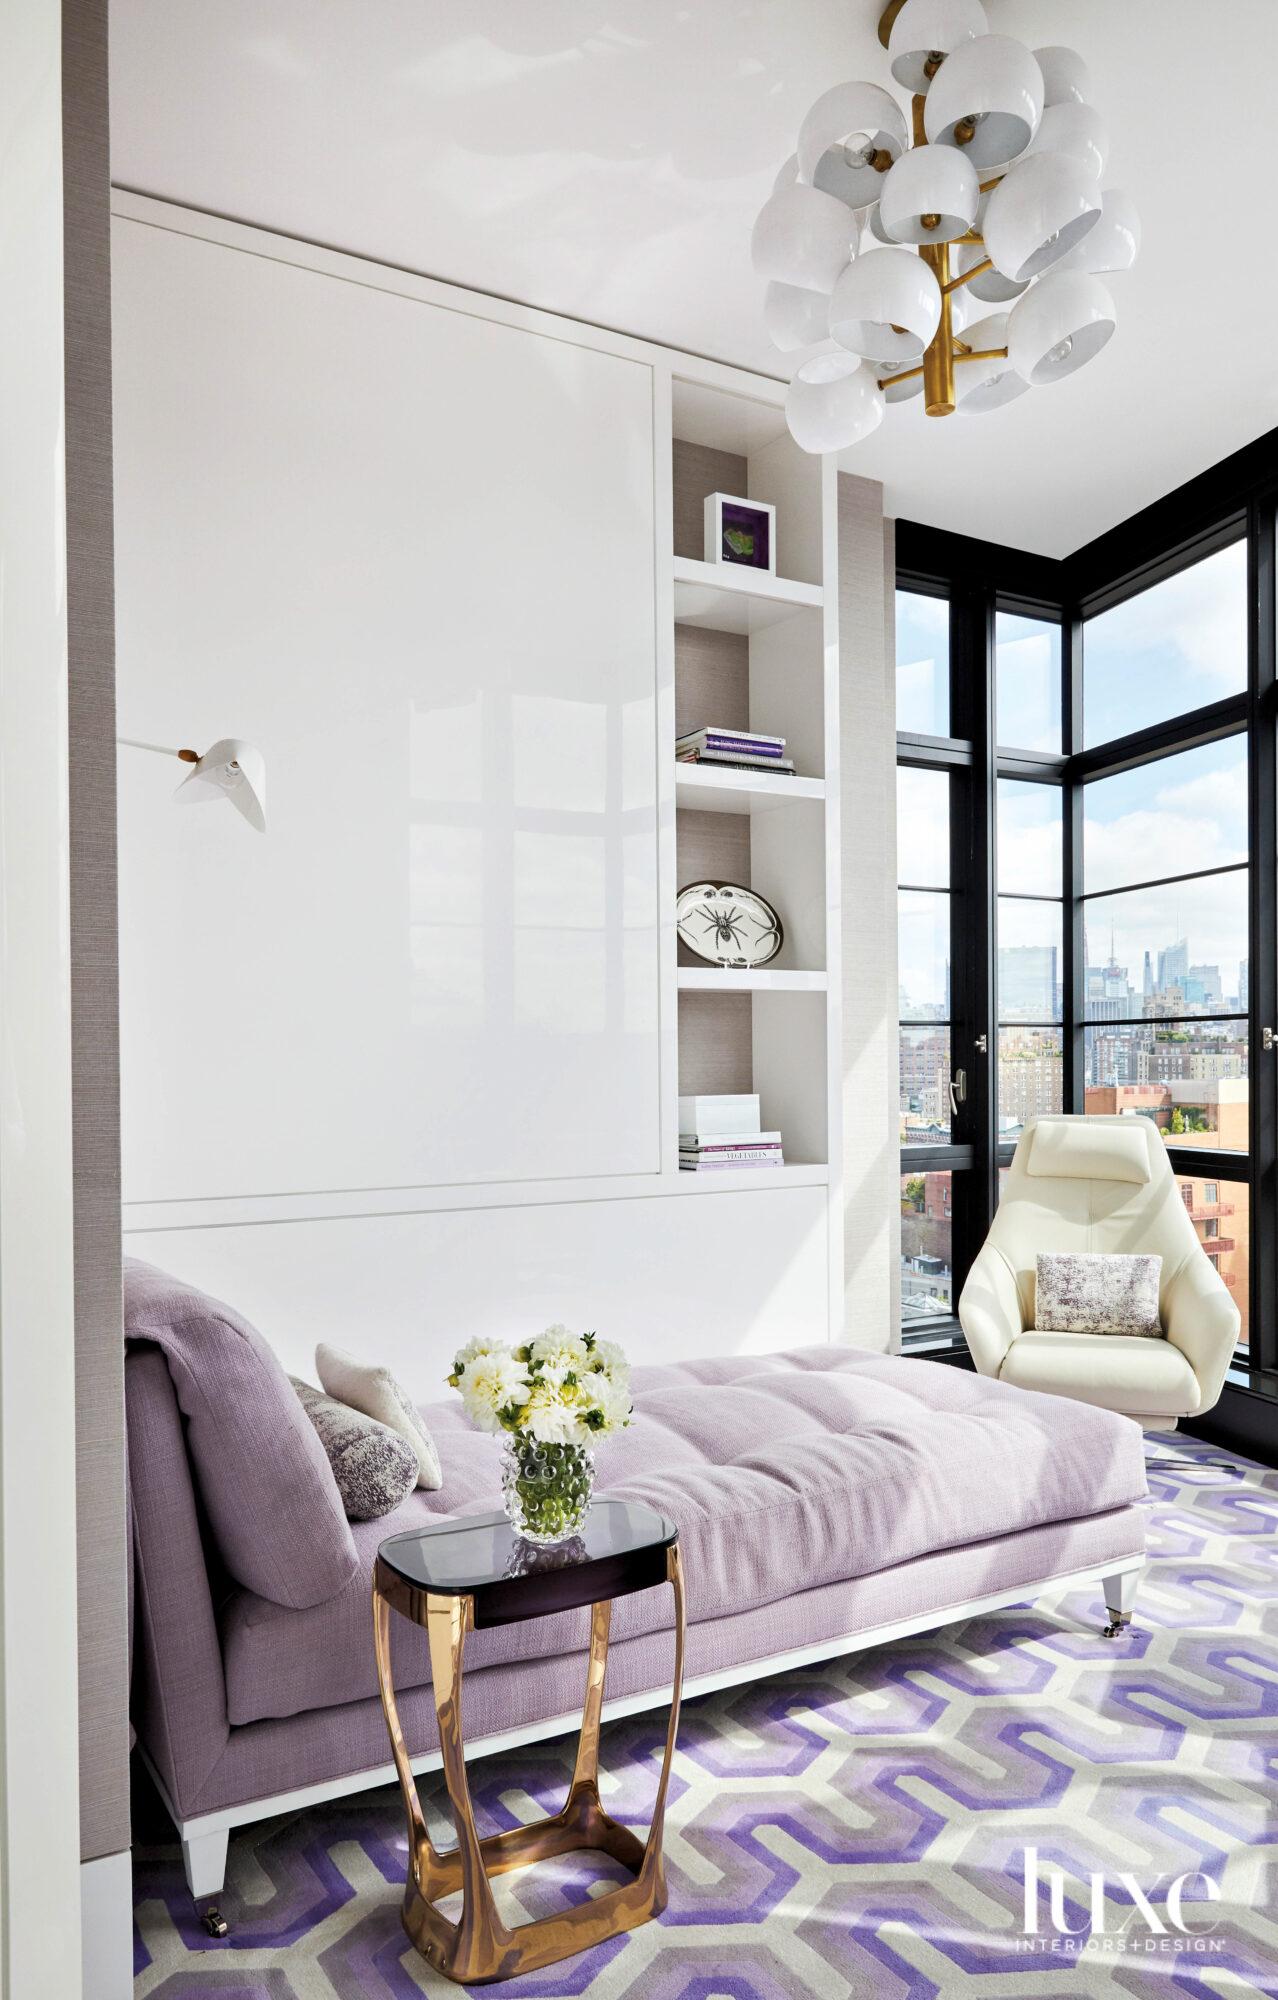 lavendar chaise lounger